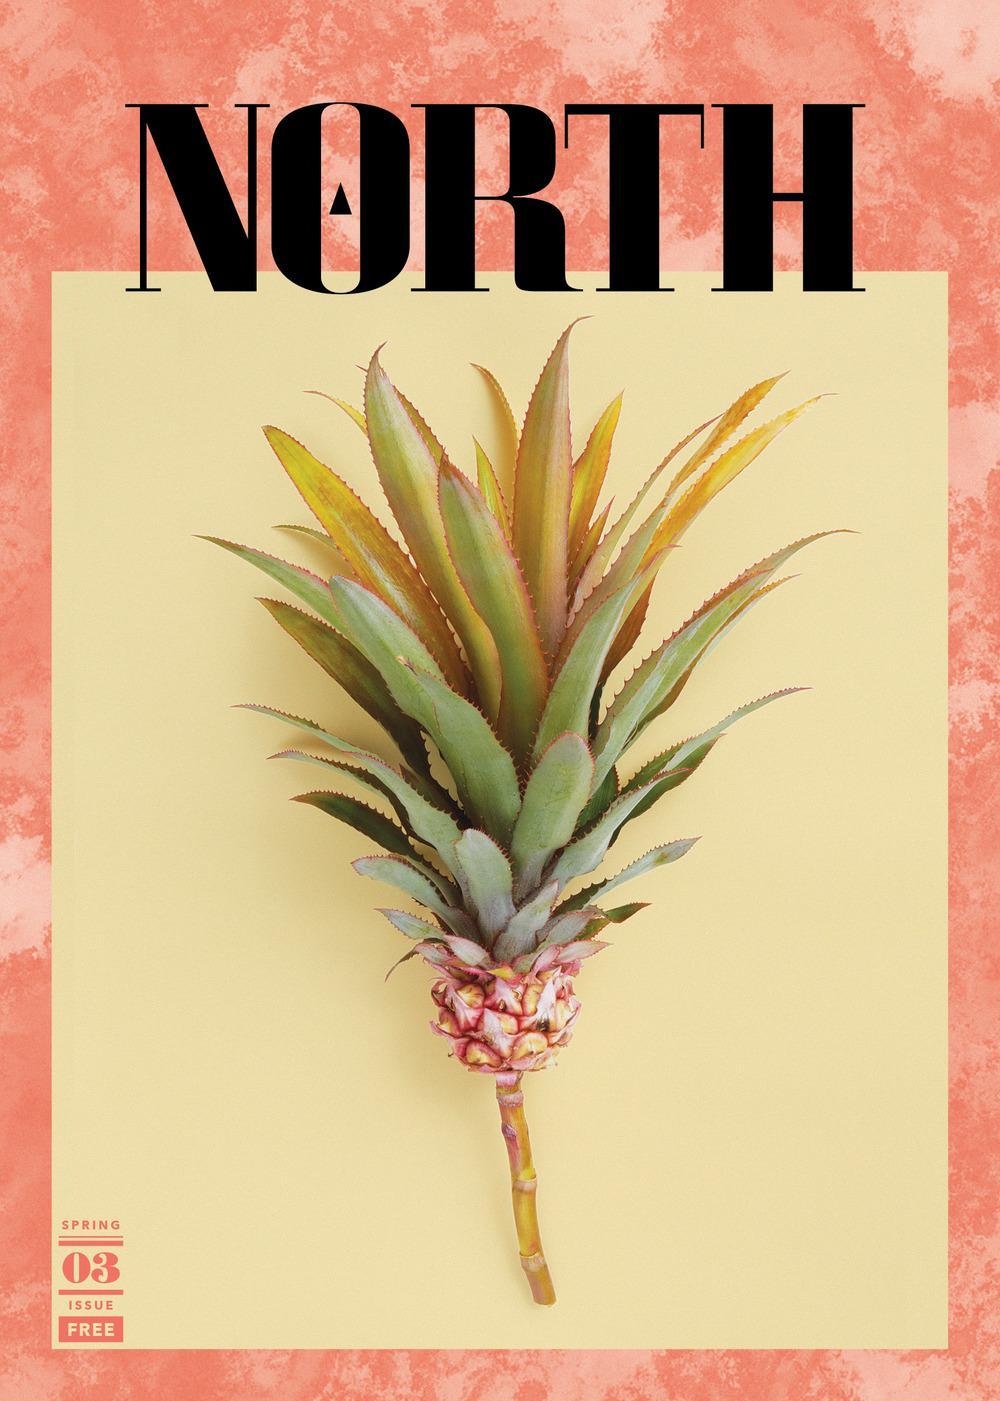 northi03p0.jpg